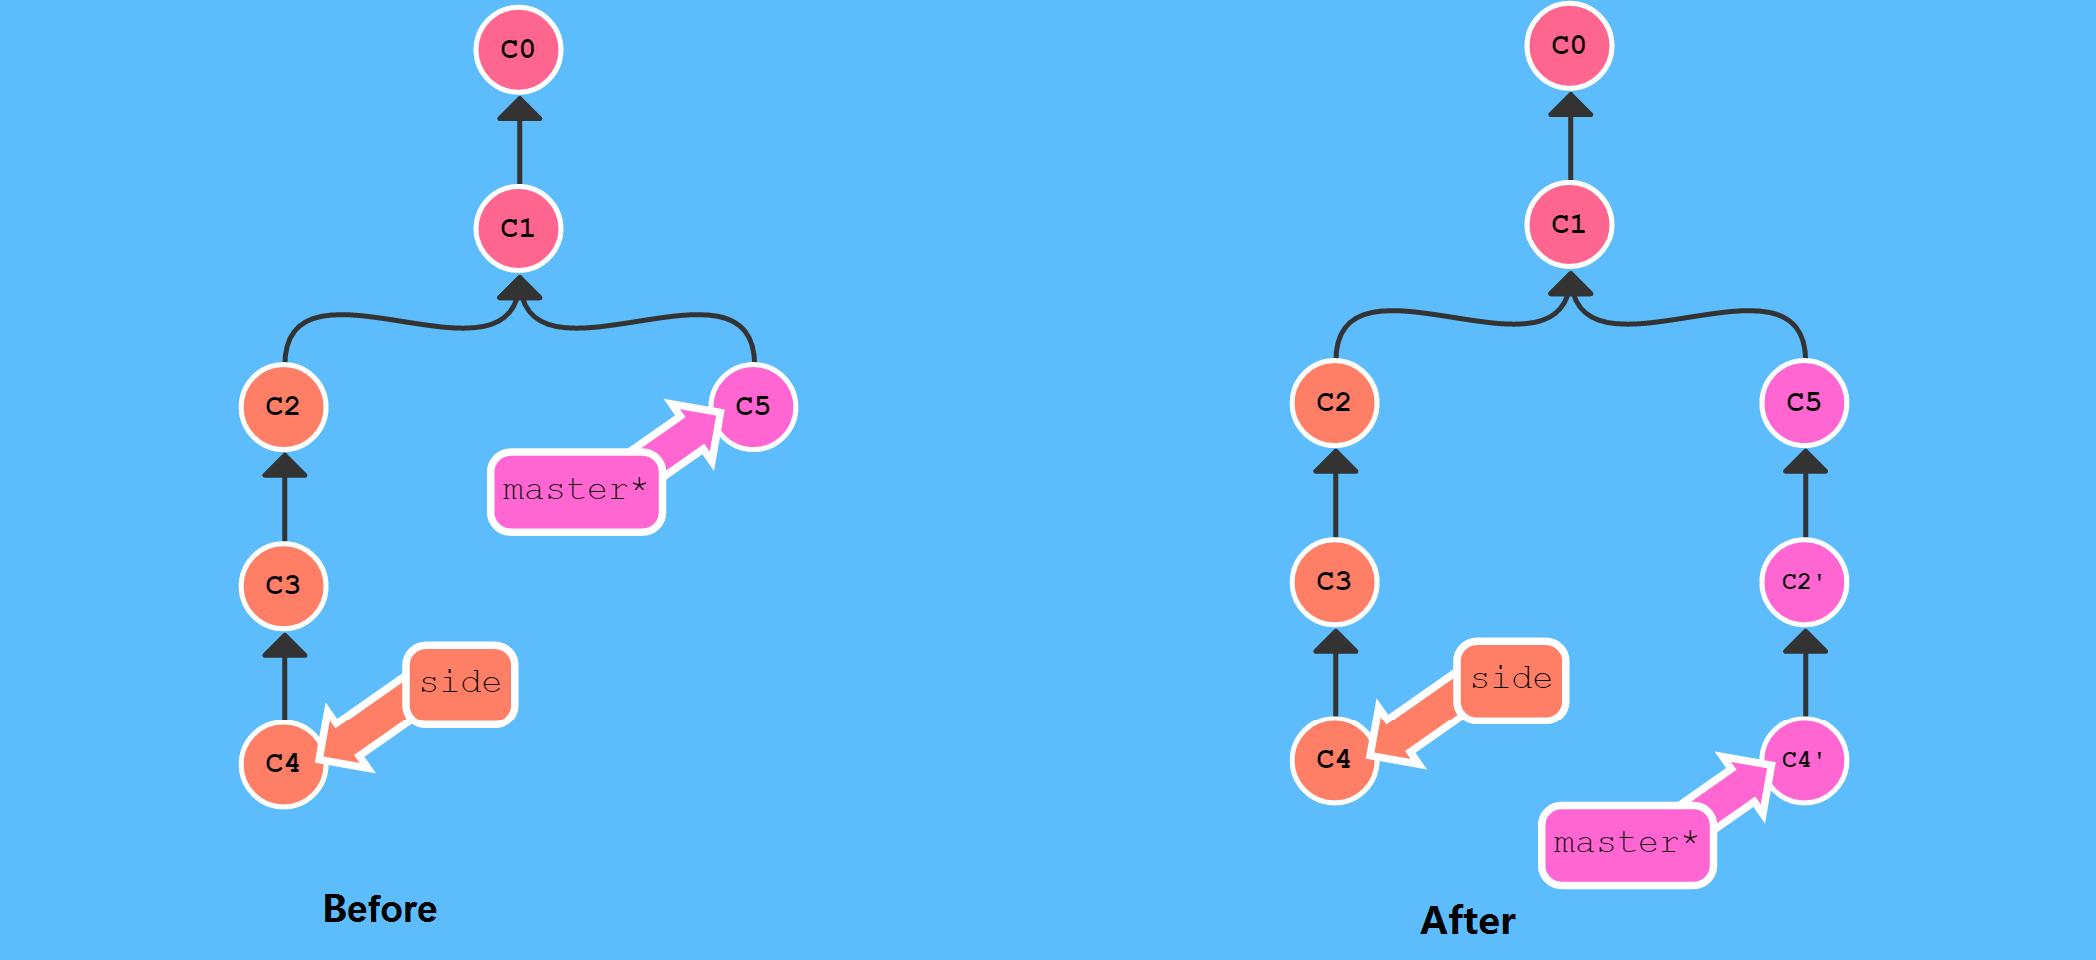 git cherry-pick命令图示,图片来源:http://learngitbranching.js.org